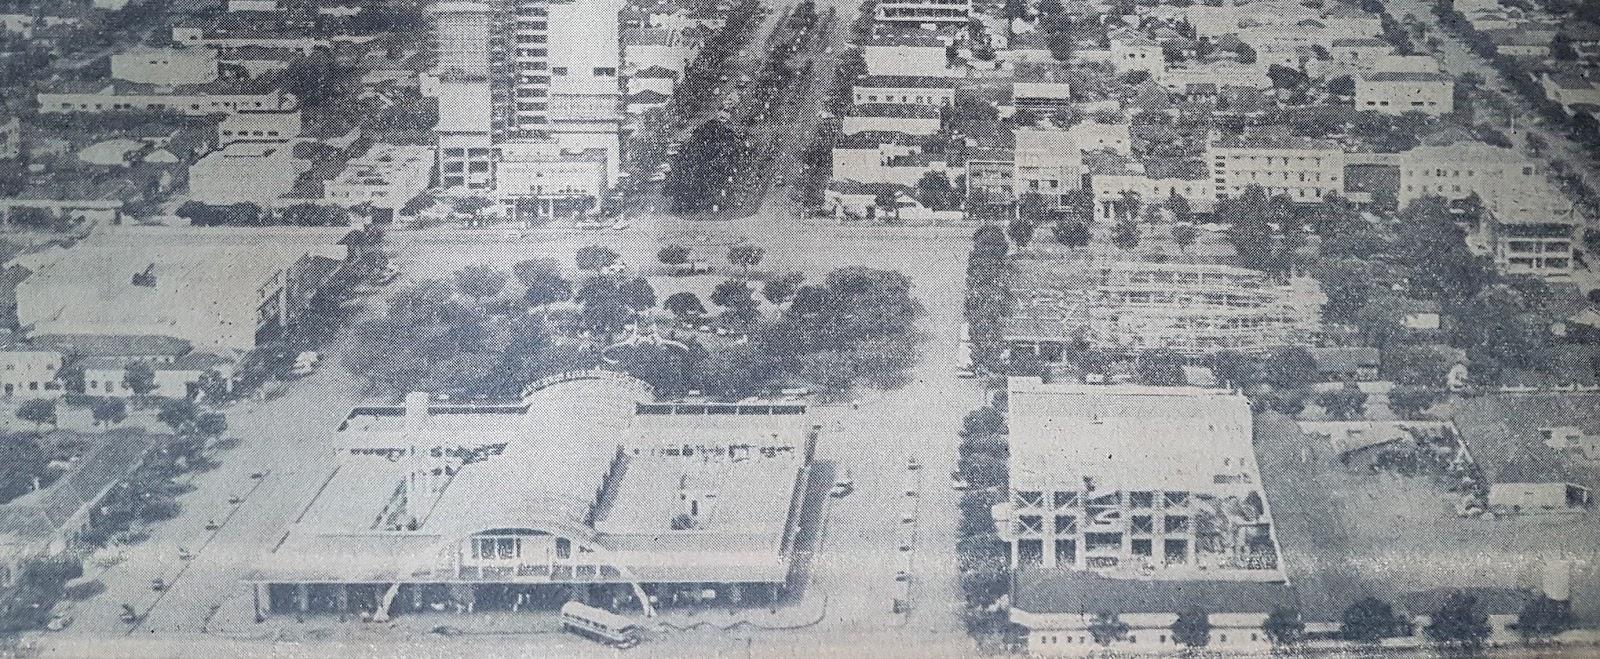 Centro de Maringá - 1964